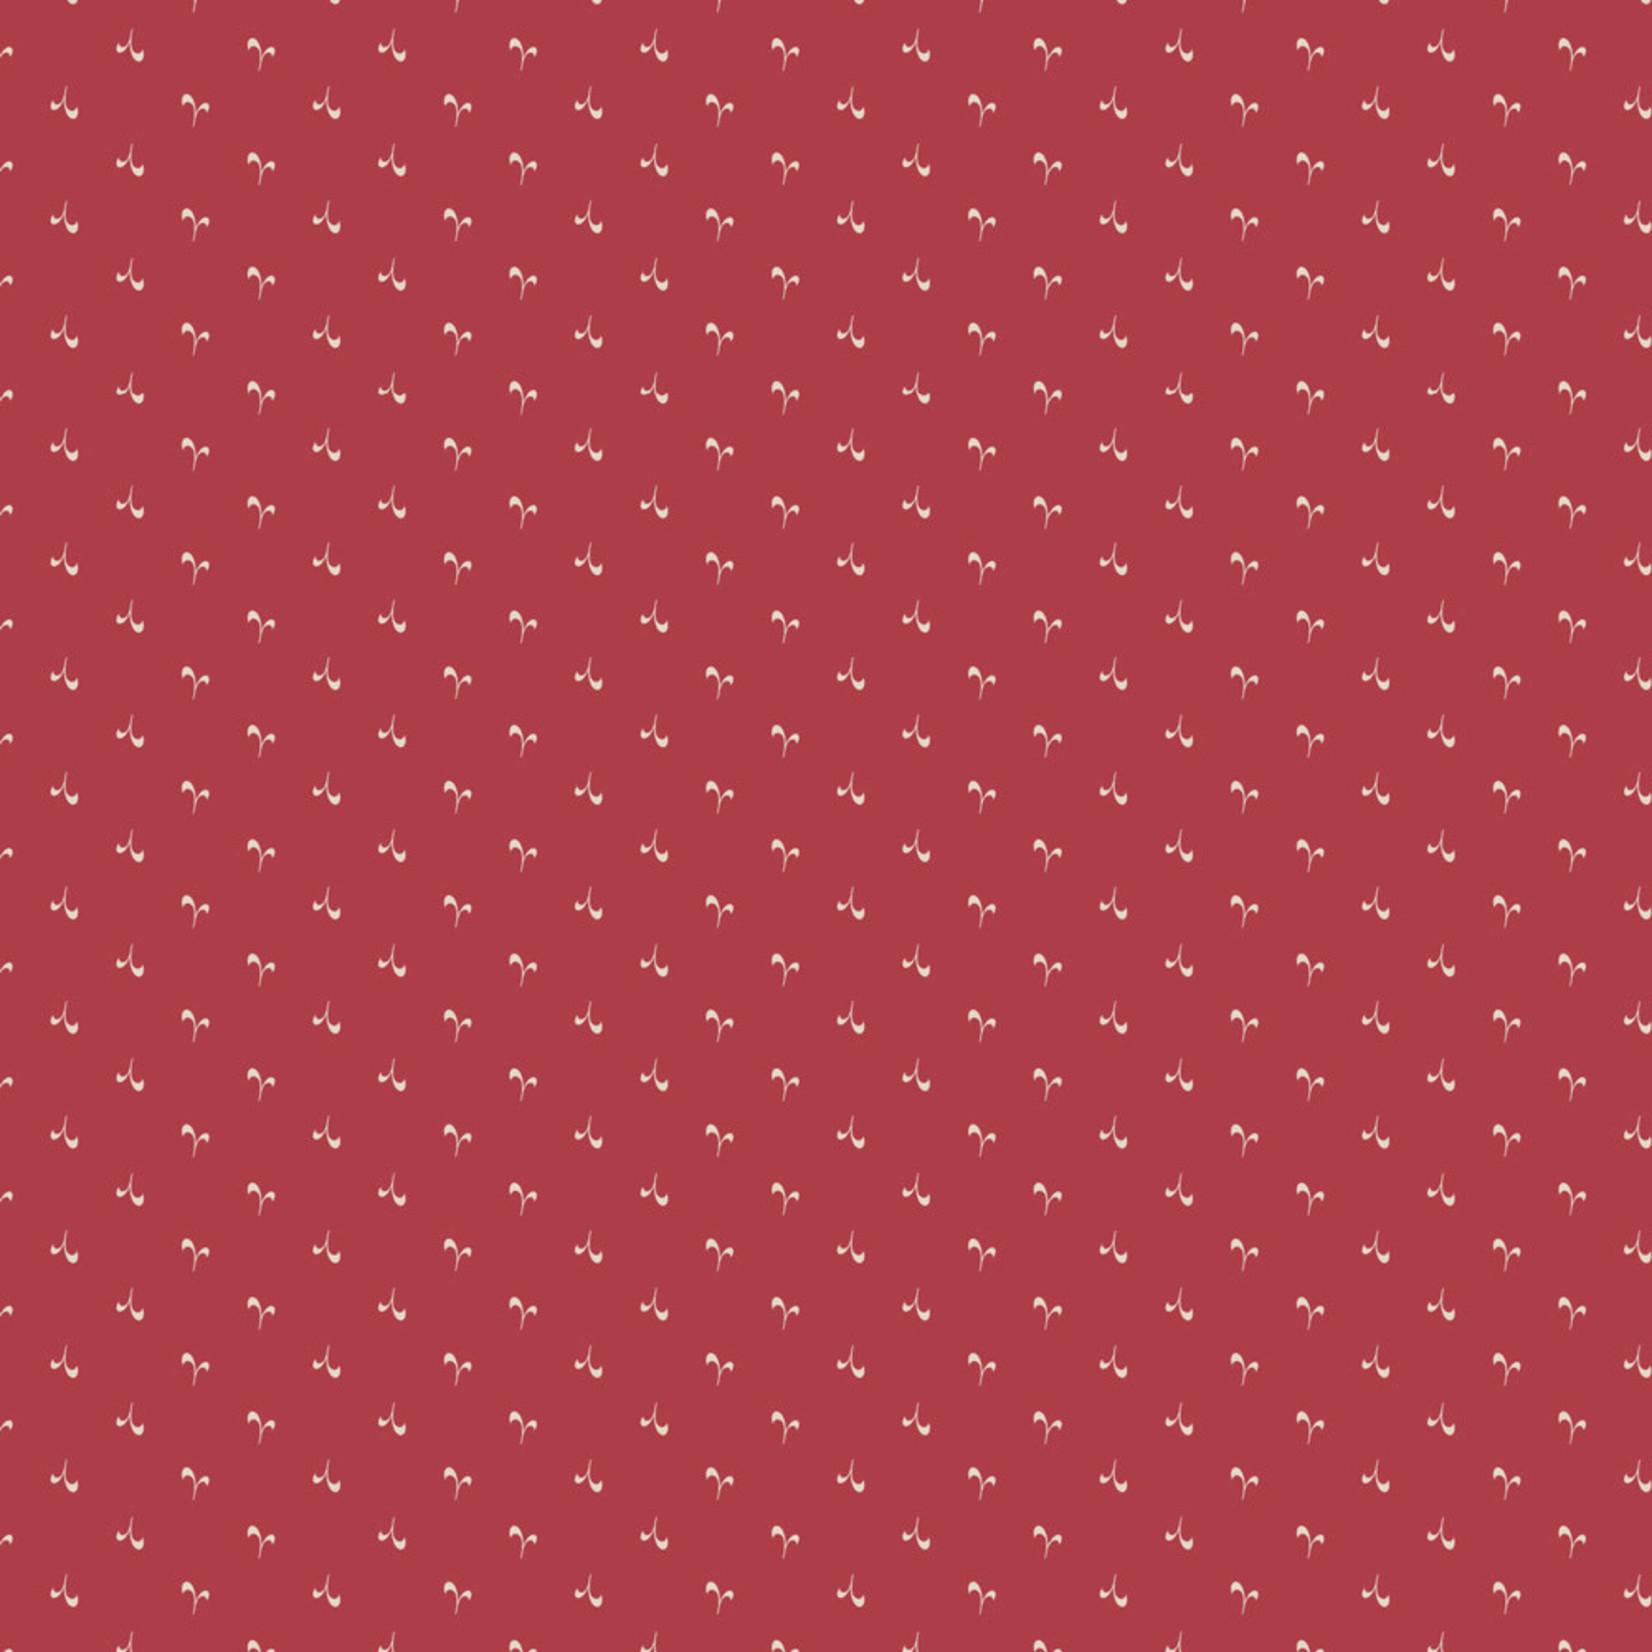 Stoffabrics Nellies Shirtlings - Check - Red